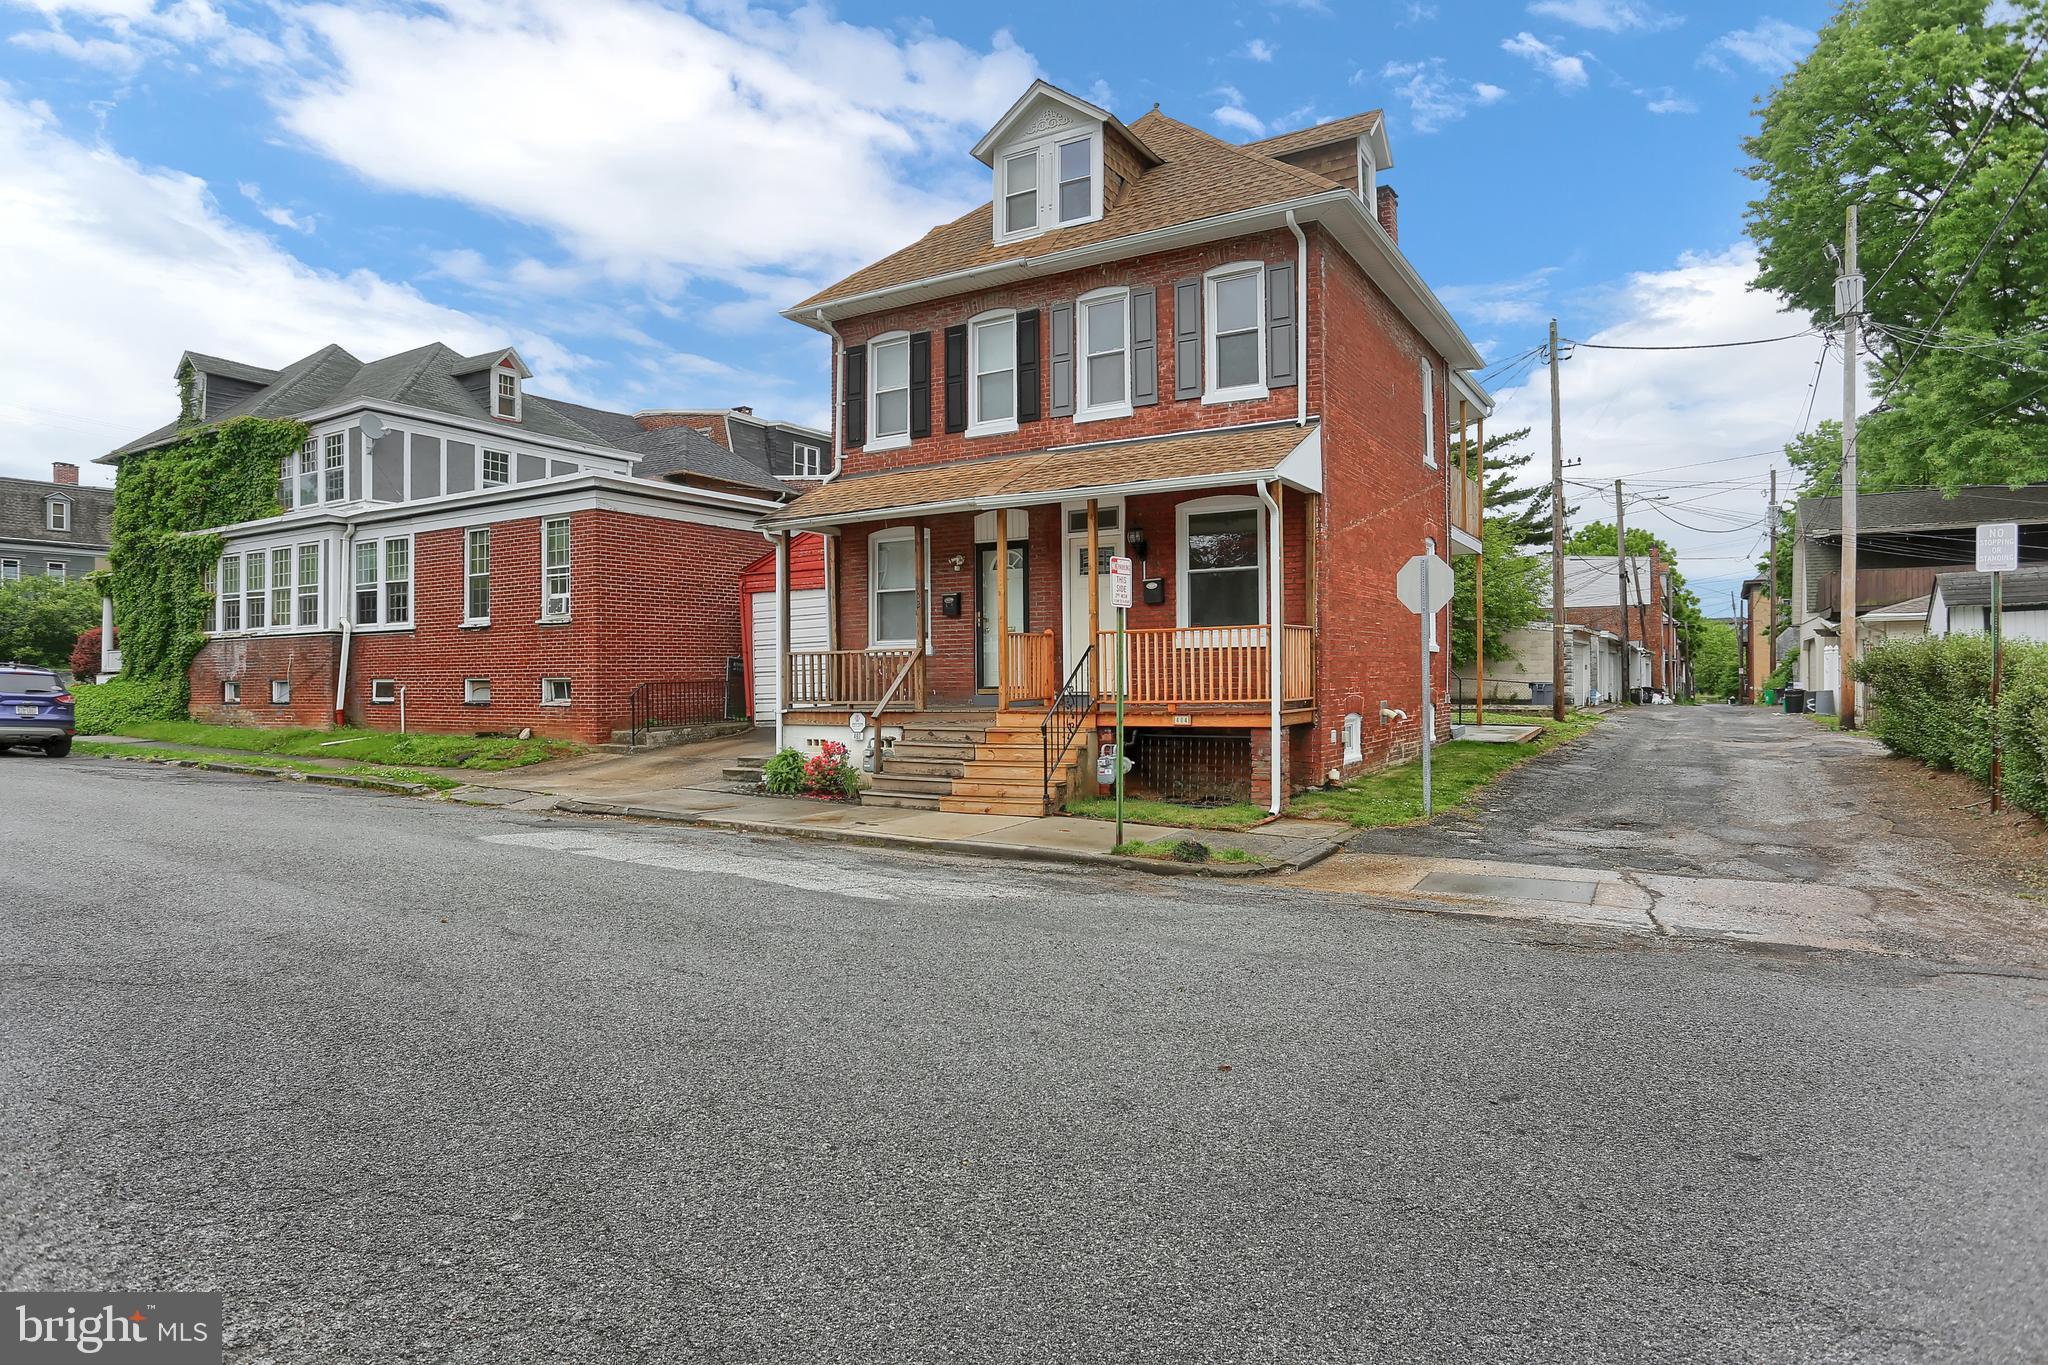 484 Lincoln Street, York, PA 17401